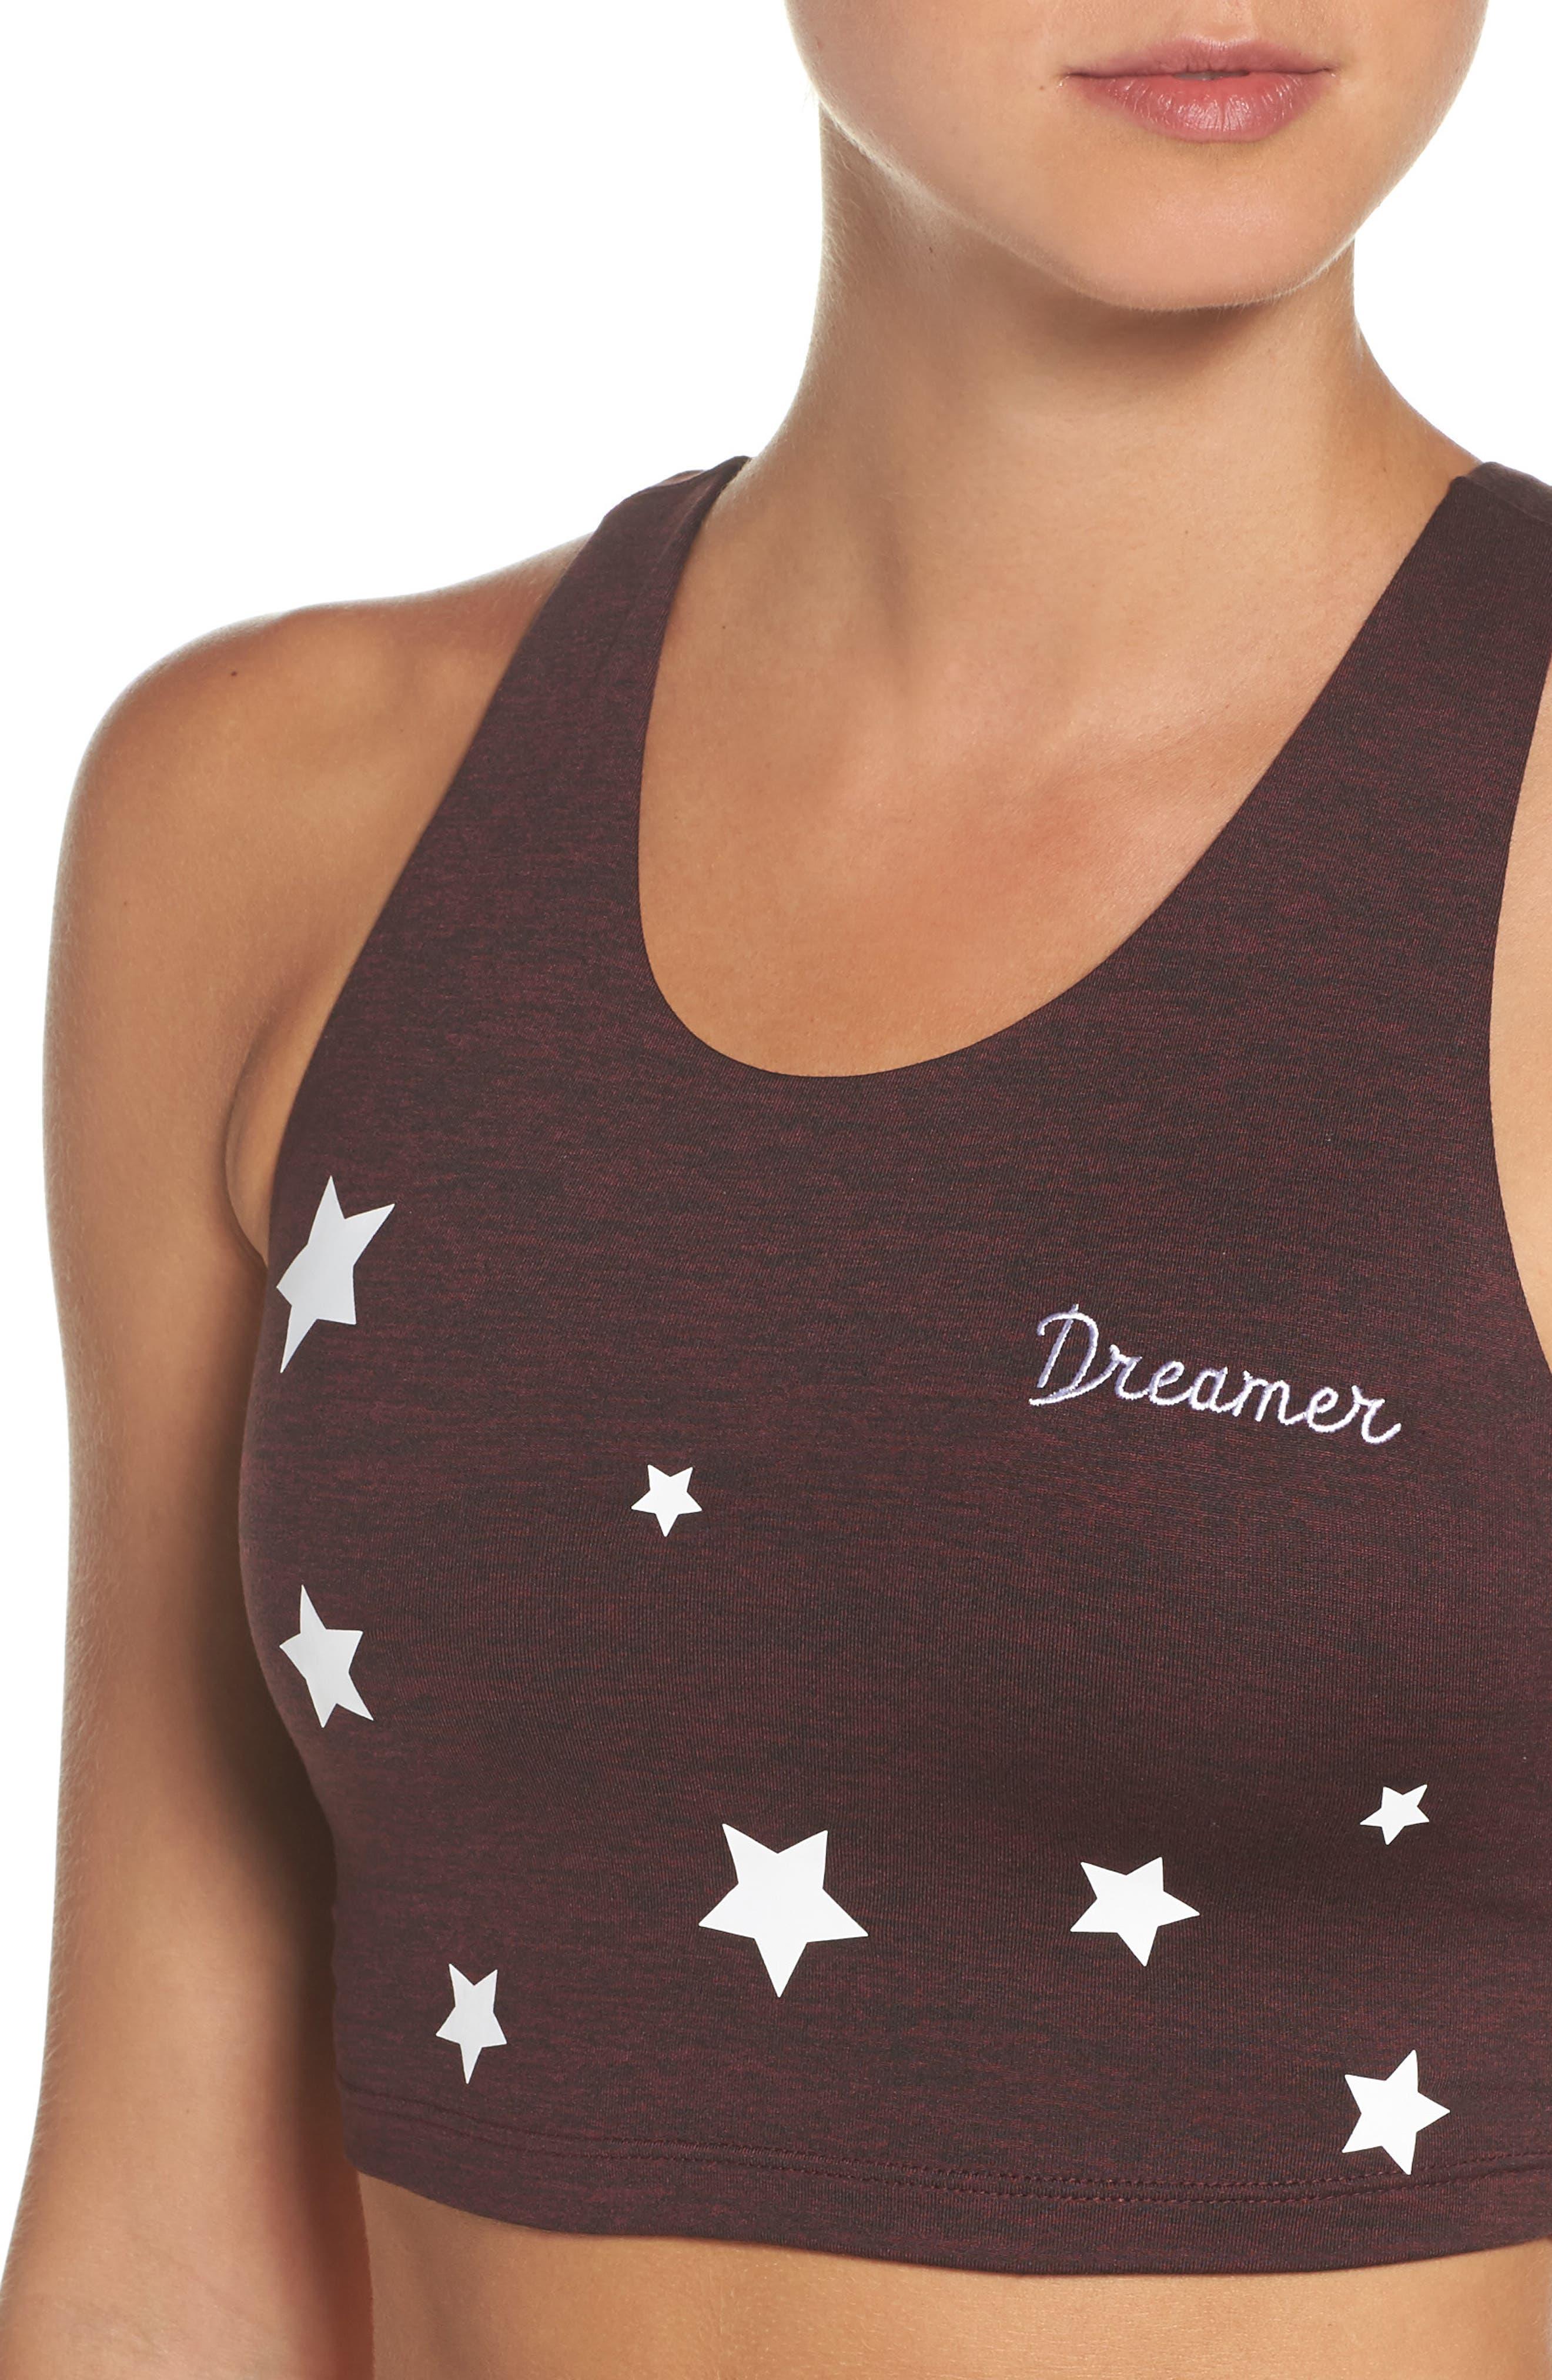 Dreamer Crop Top,                             Alternate thumbnail 4, color,